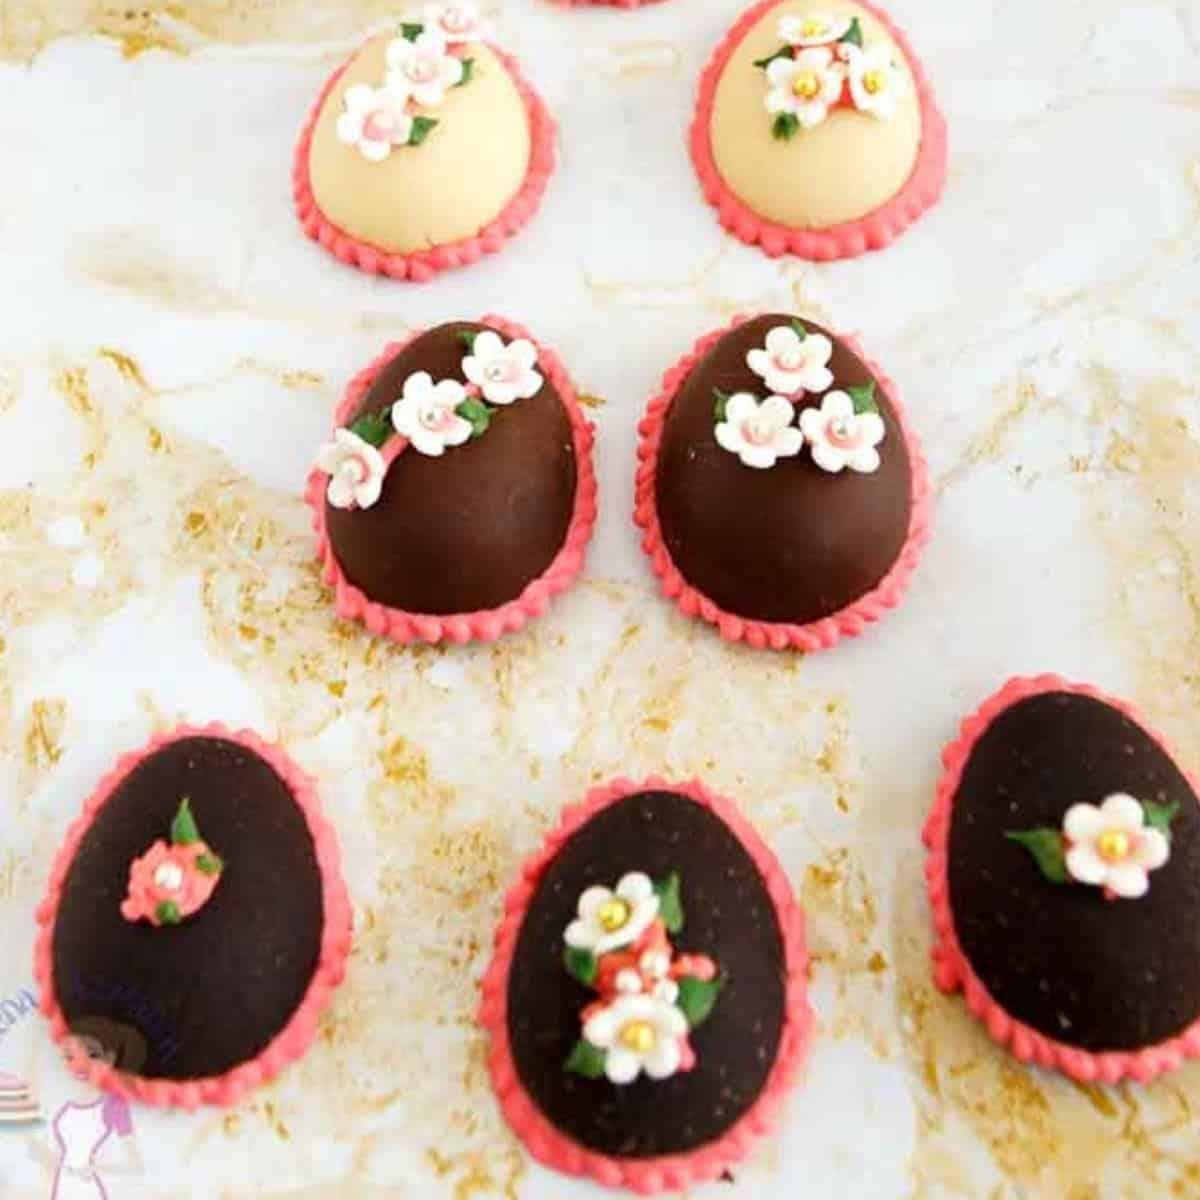 Chocolate marzipan eggs on a table.